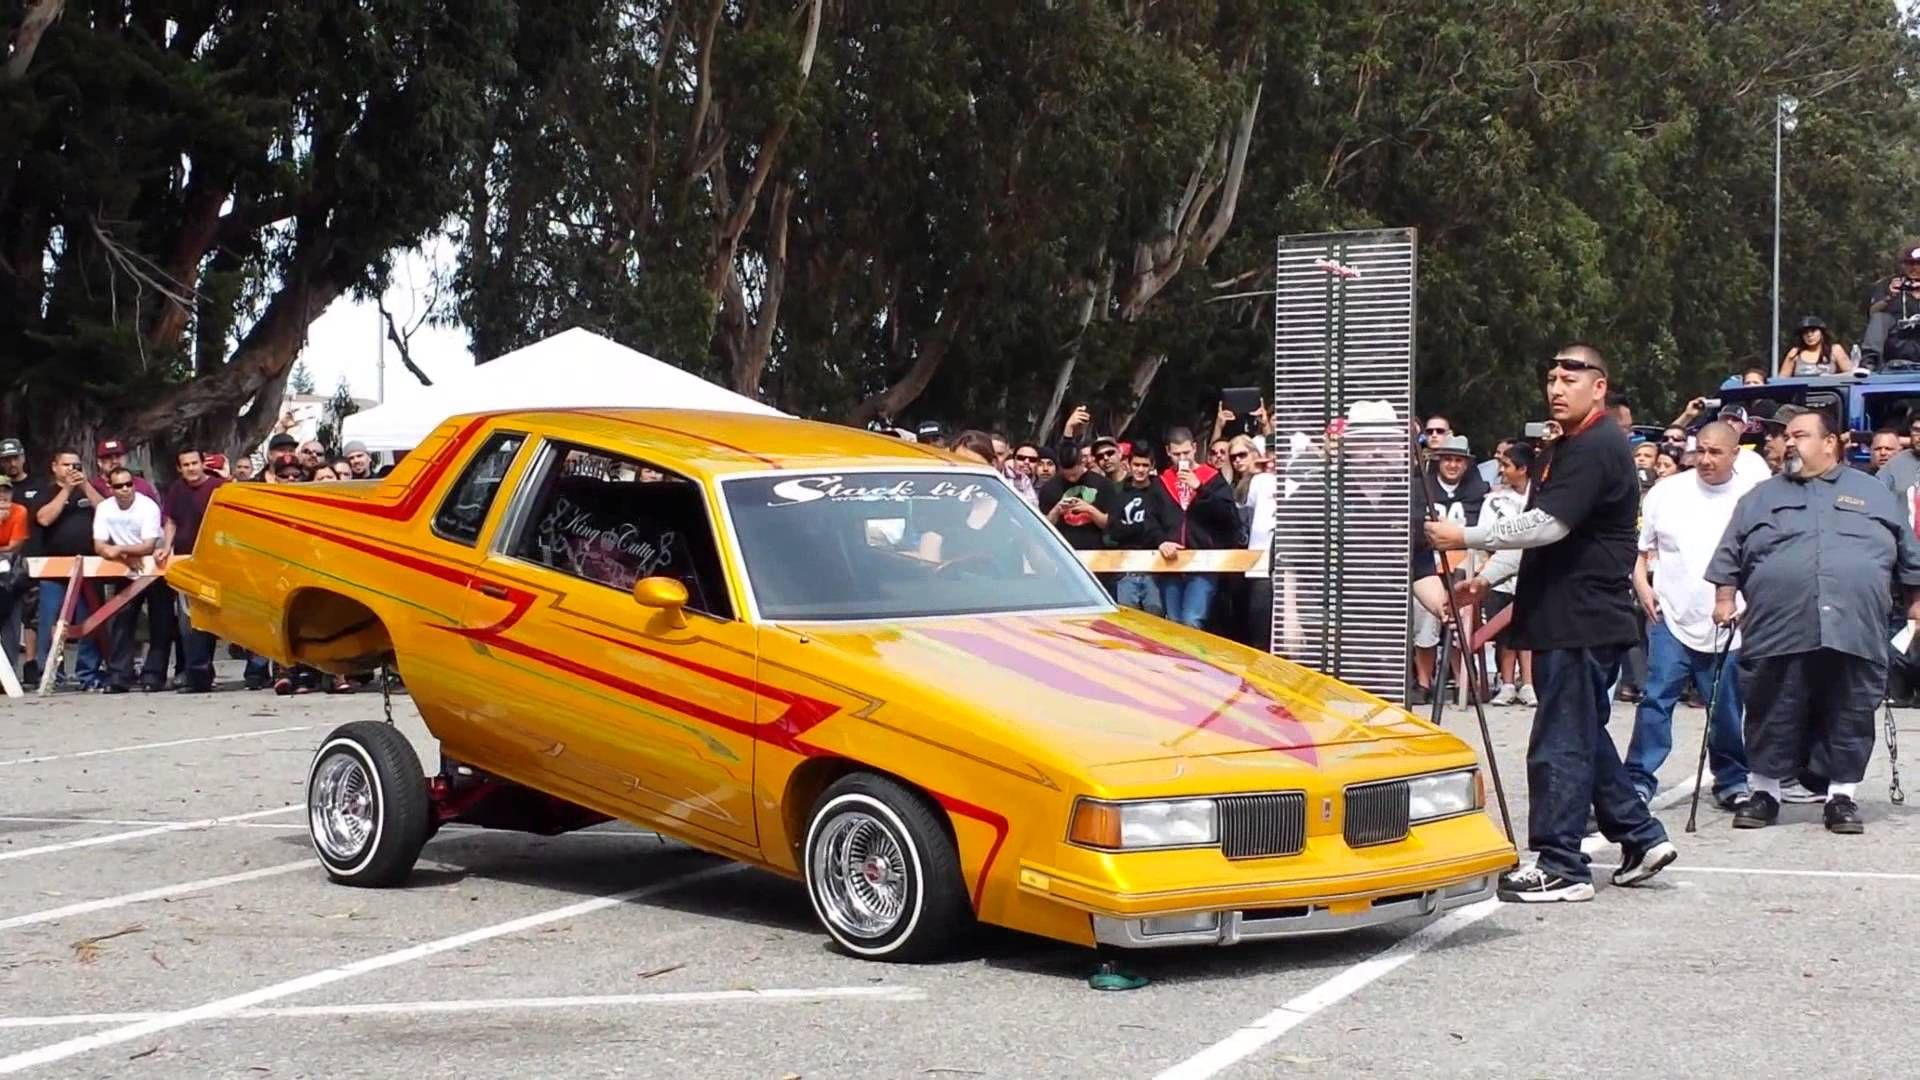 StreetLow Salinas Car Show Httpswwwdraggirlscomstreetlow - Salinas car show